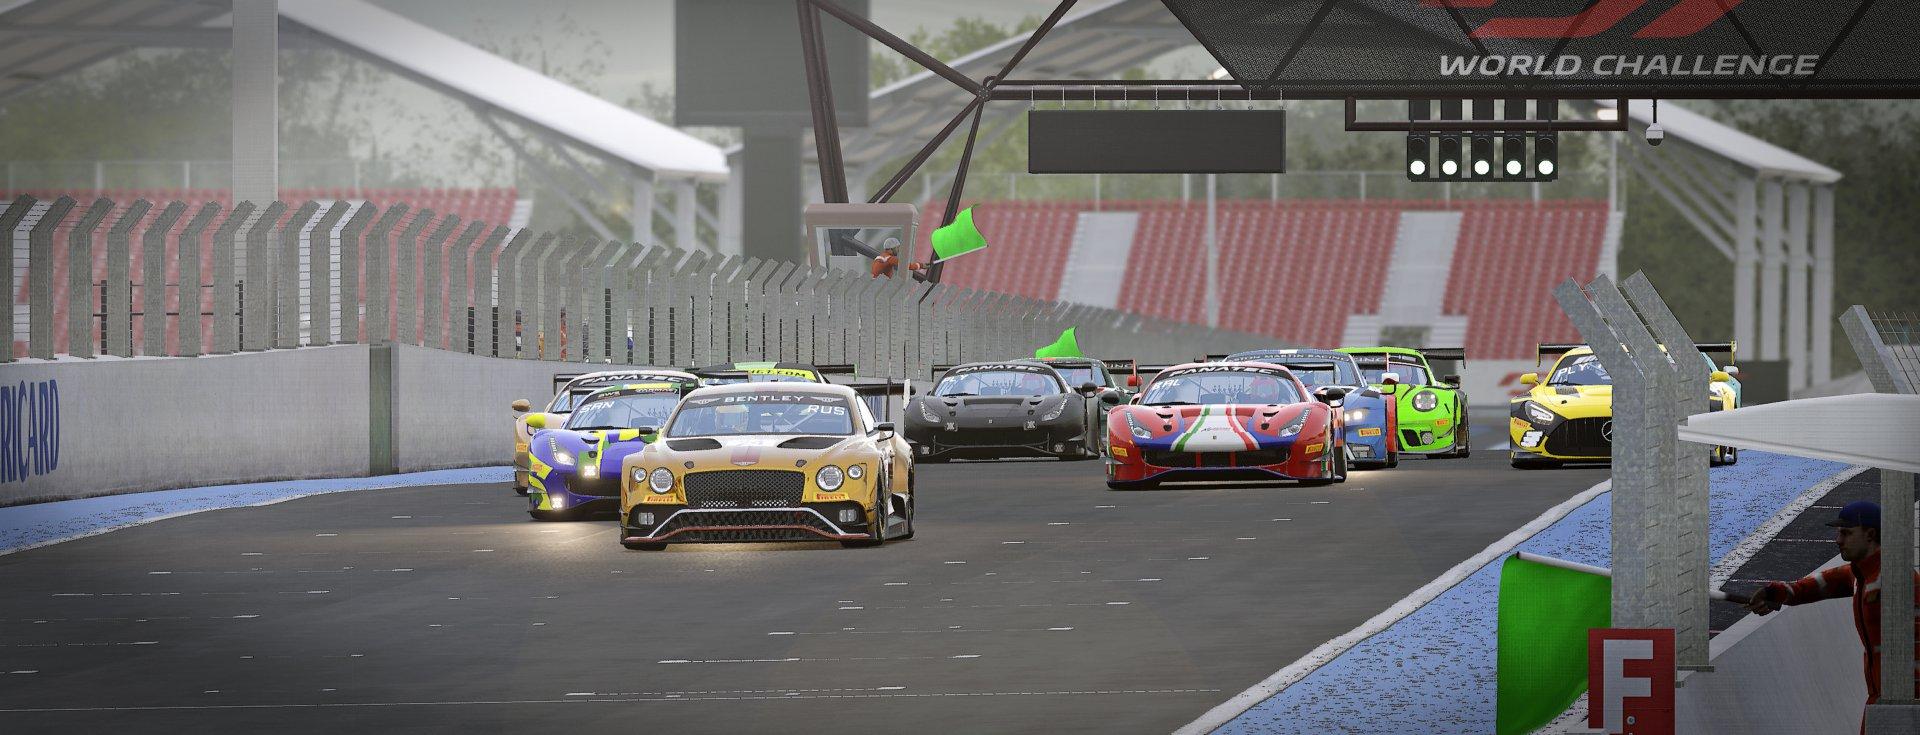 Assetto Corsa Competizione Screenshot 2021.05.17 - 11.13.45.12.jpg